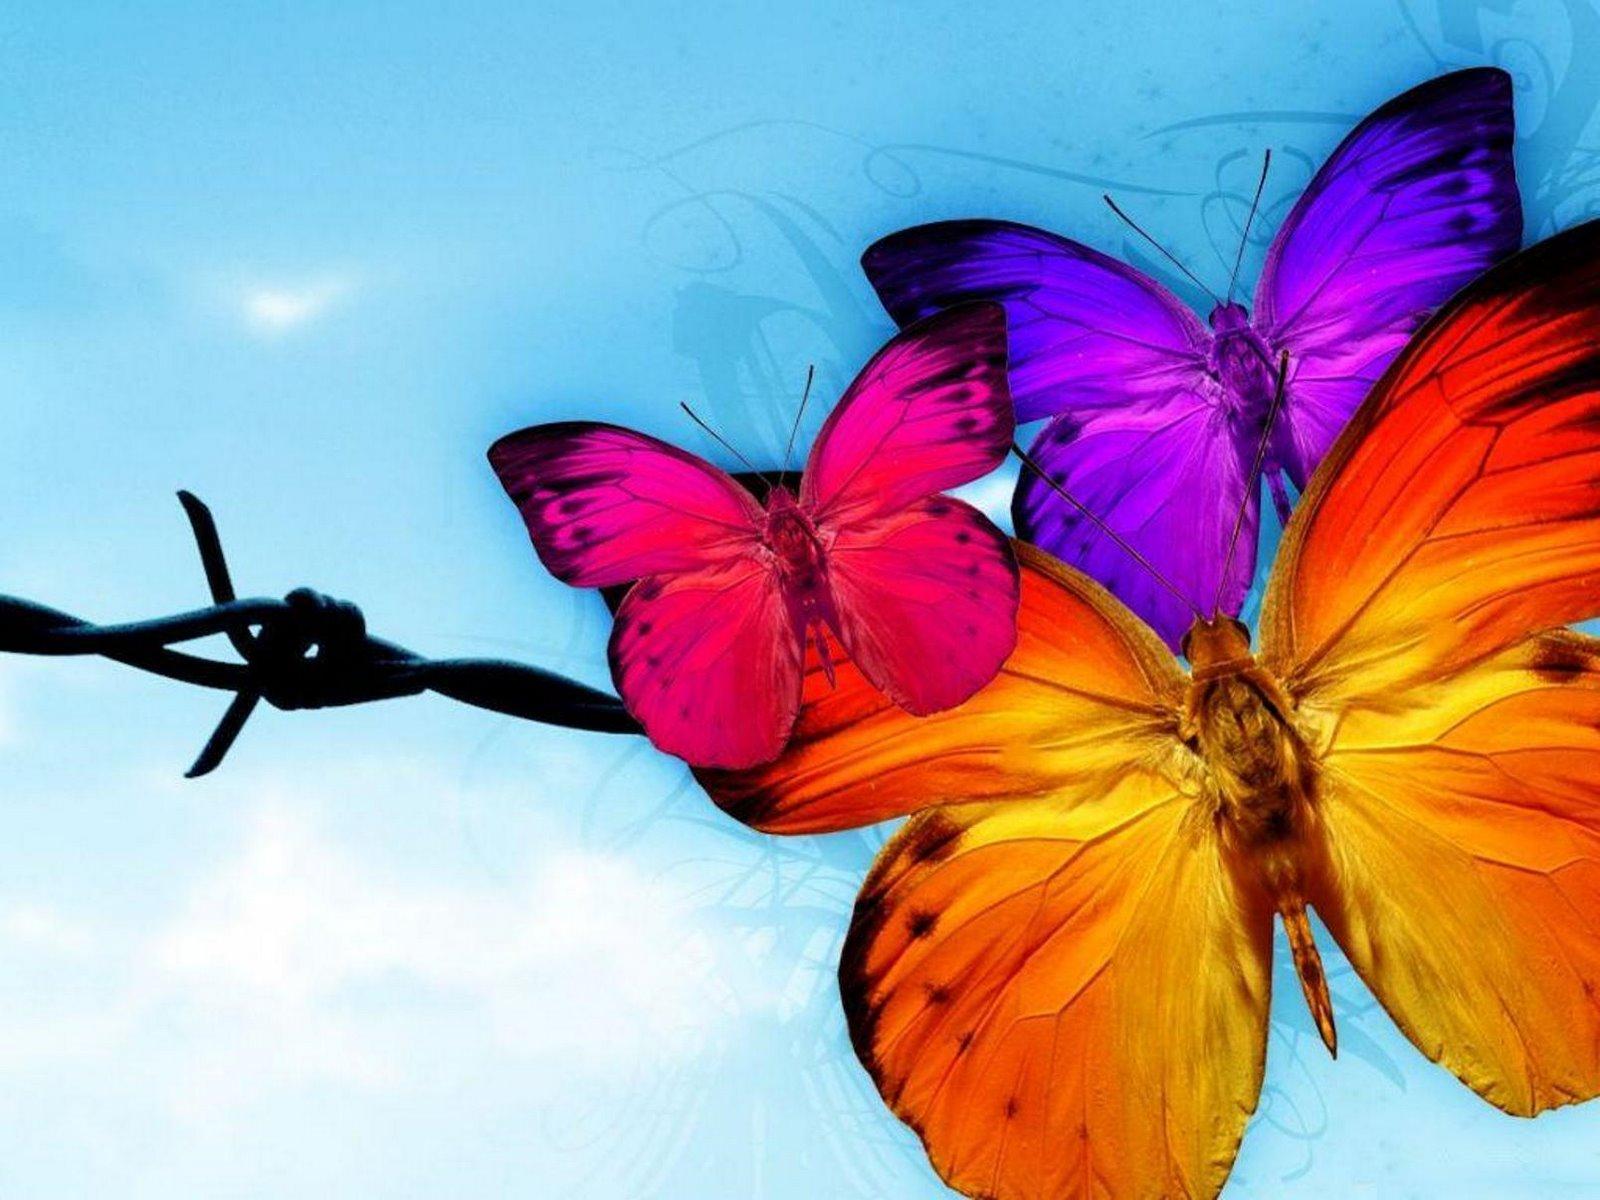 Butterflies Wallpapers HD wallpapers   Coloured Butterflies Wallpapers 1600x1200